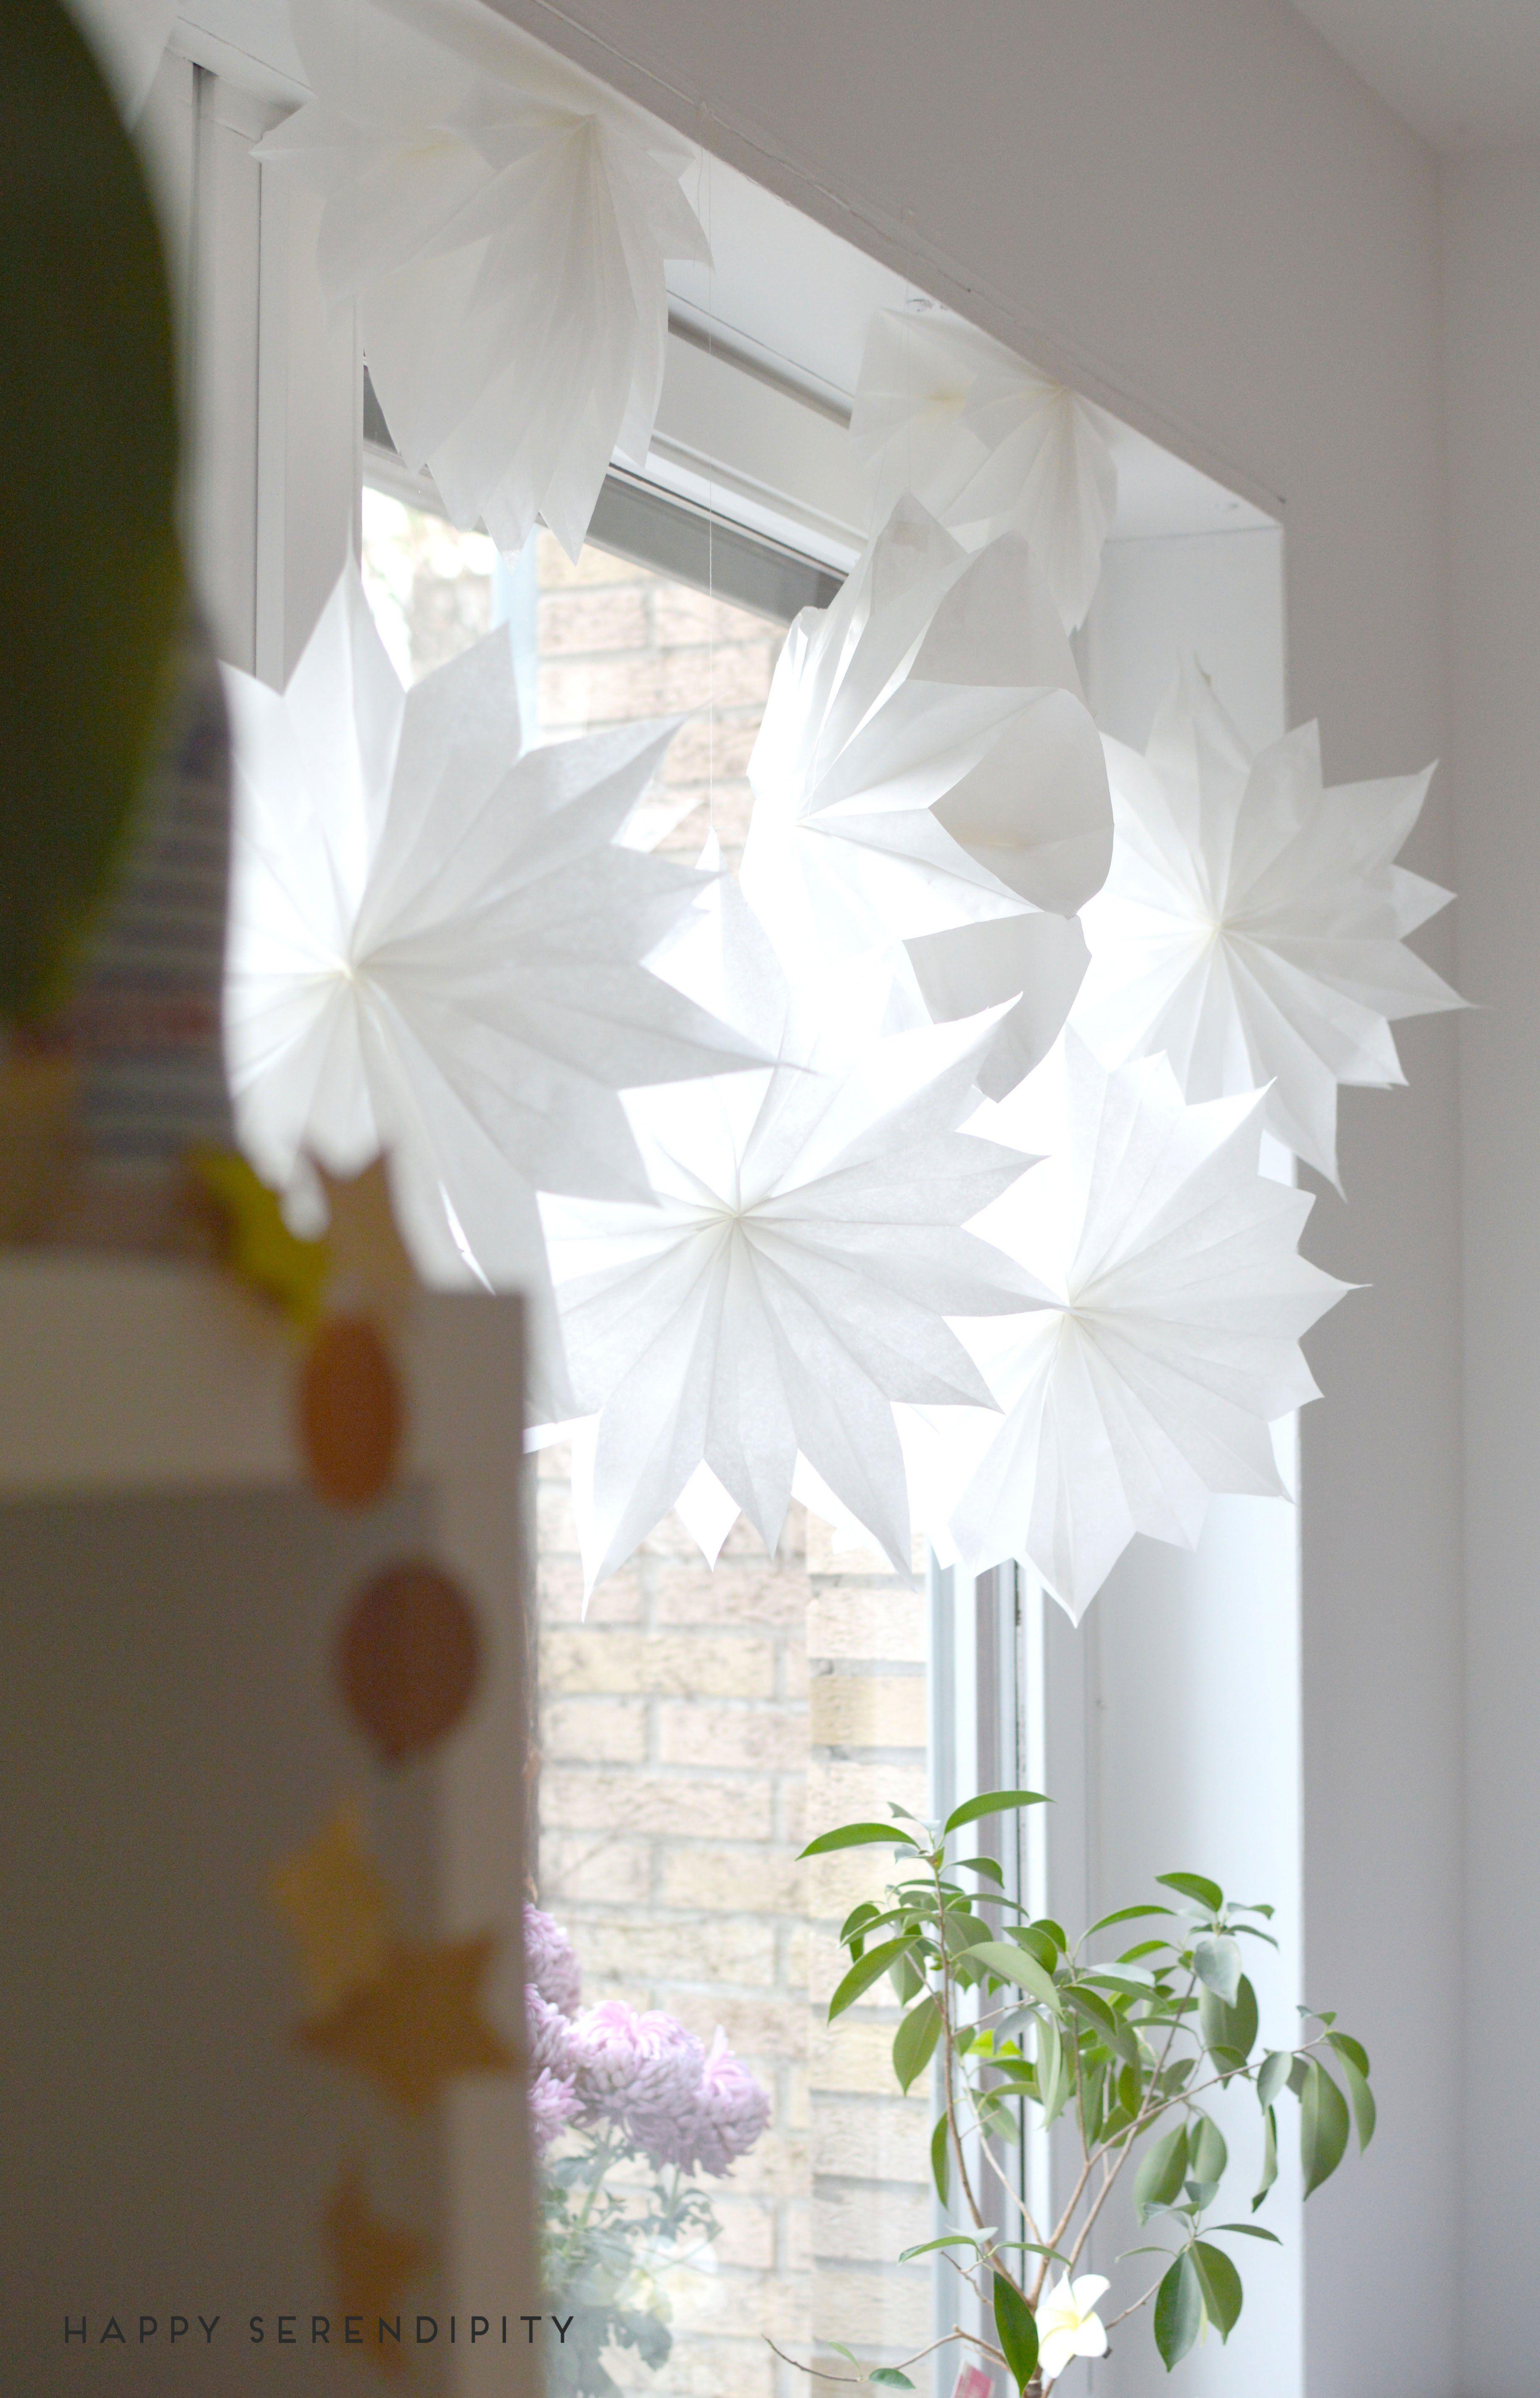 diy sterne aus butterbrotpapier und tapete sterne aus butterbrotpapier butterbrotpapier und. Black Bedroom Furniture Sets. Home Design Ideas